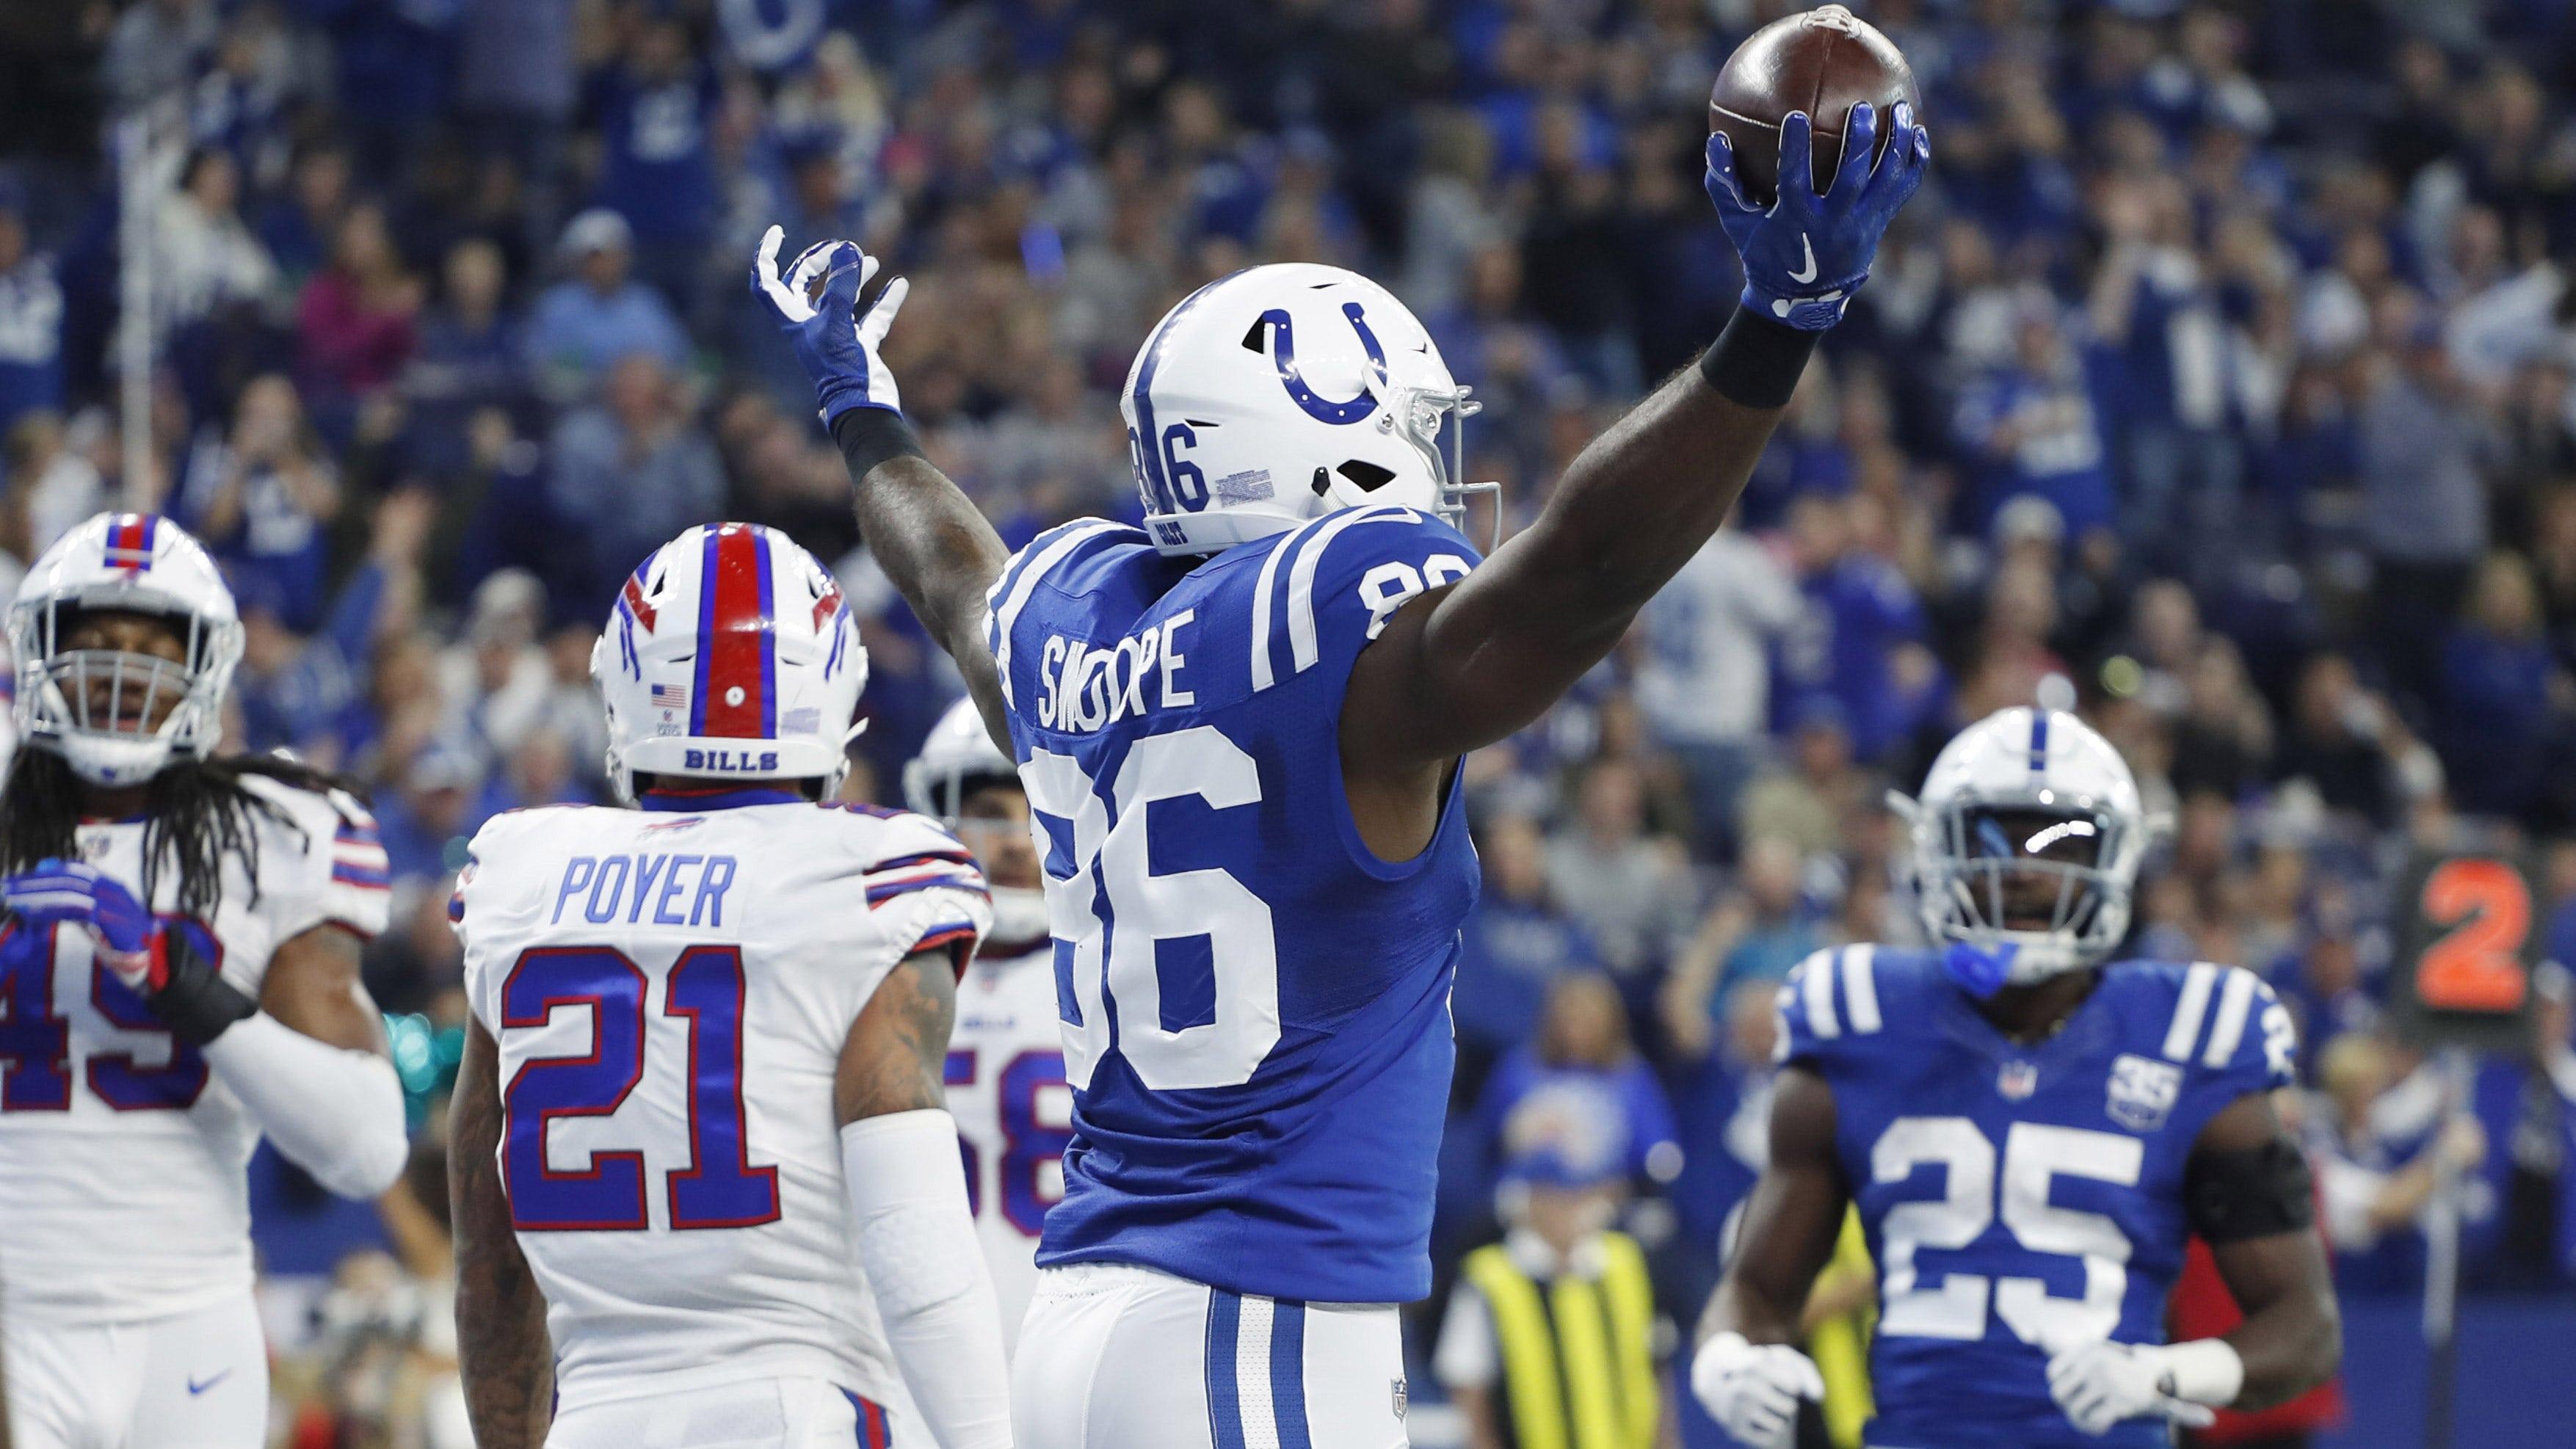 ec44a17d Colts, Luck clobber Bills through the air in 37-5 win | FOX Sports